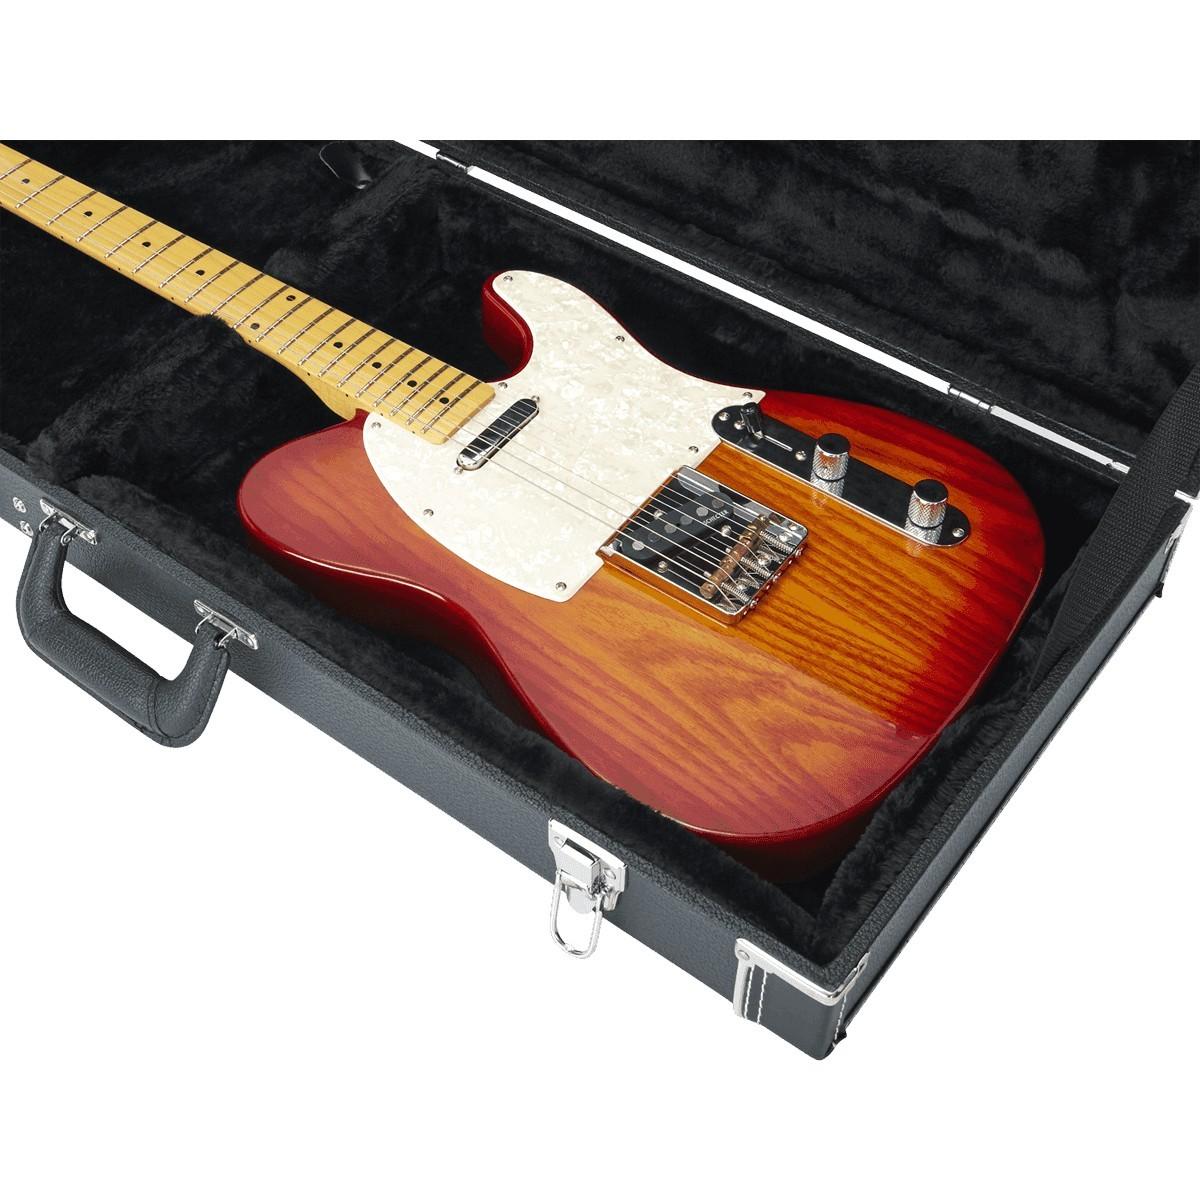 GATOR Etui Guitare Bois Deluxe GW Type Electrique Noir